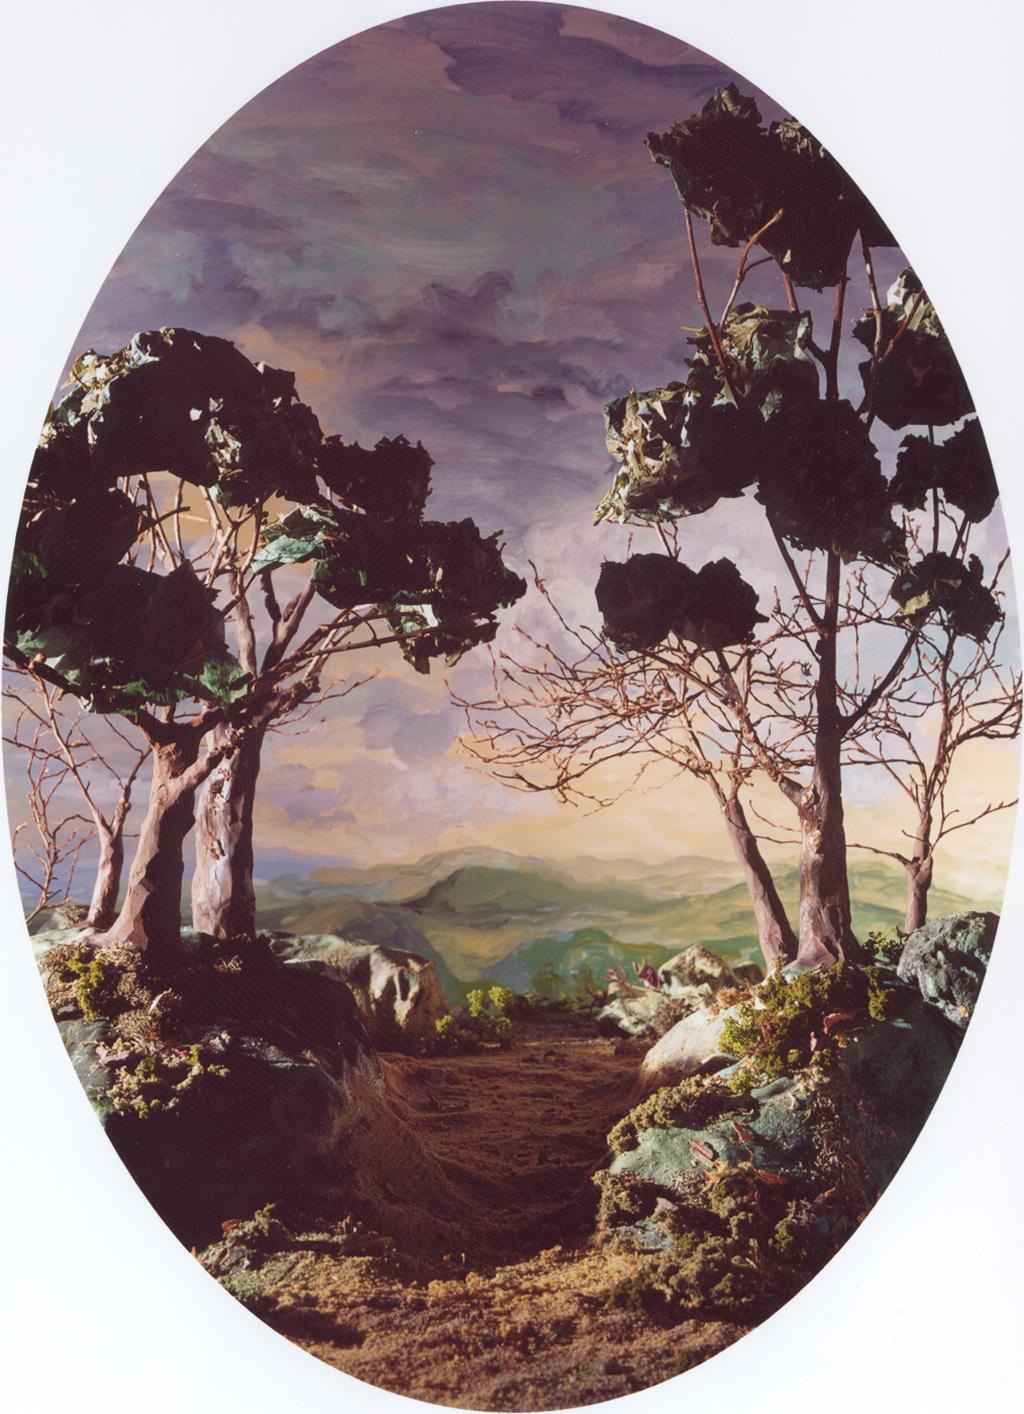 Lush, 2003, chromogenic print, 153x109 cm.